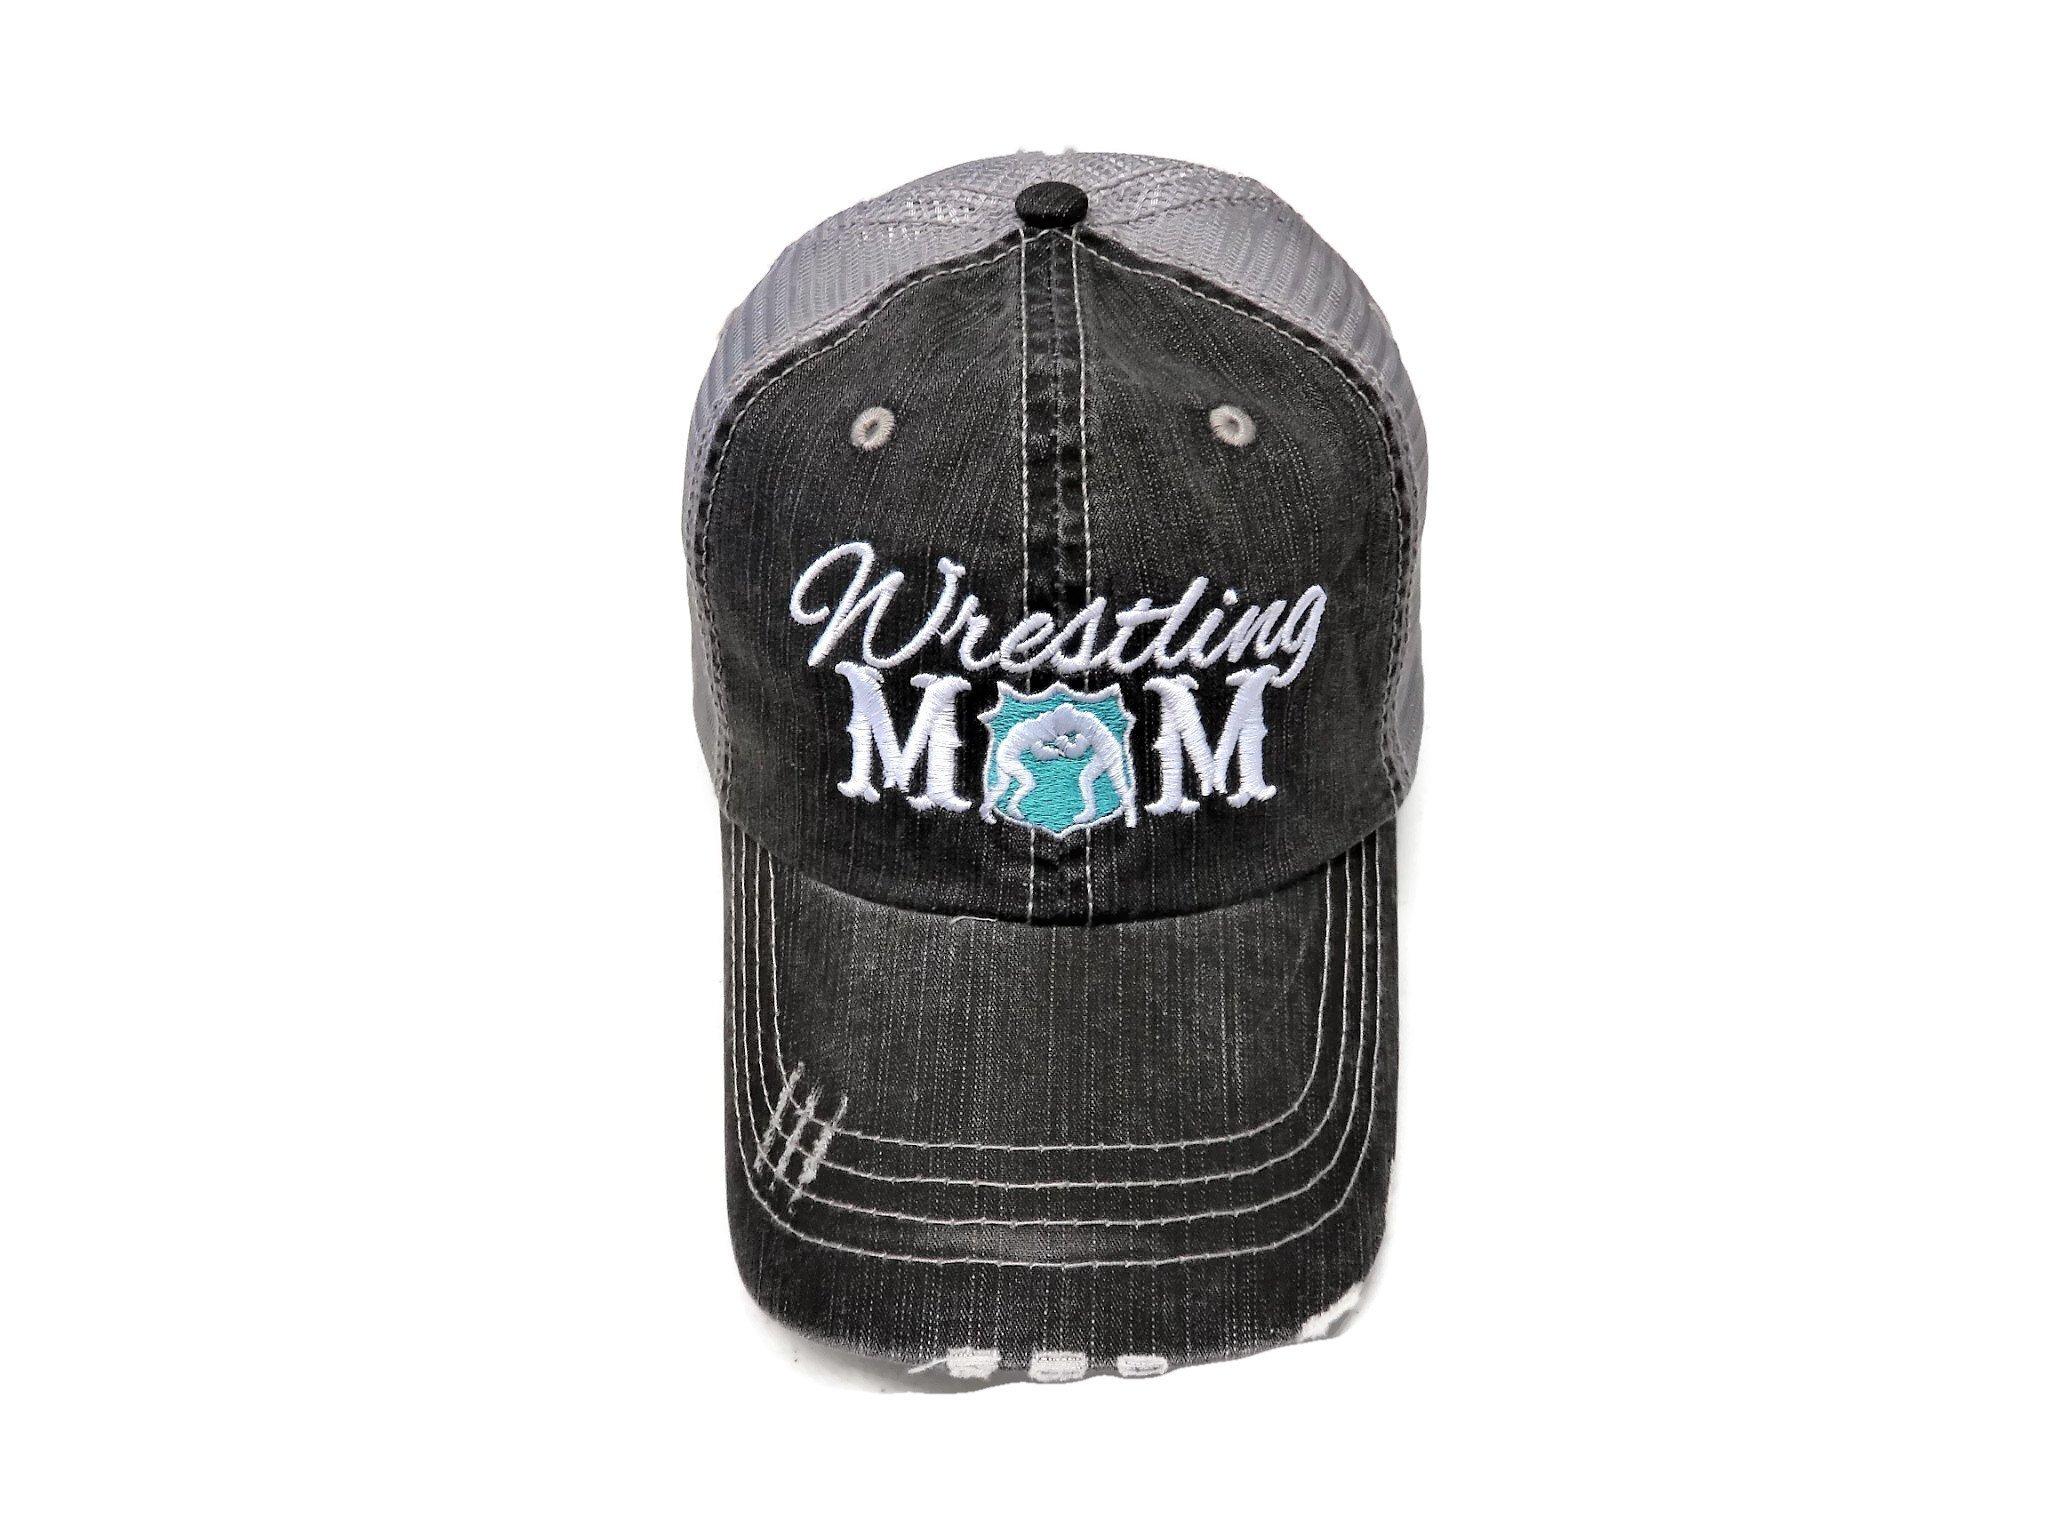 Spirit Caps Embroidered Wrestling Mom Distressed Grey Trucker Cap Hat Mint by Spirit Caps